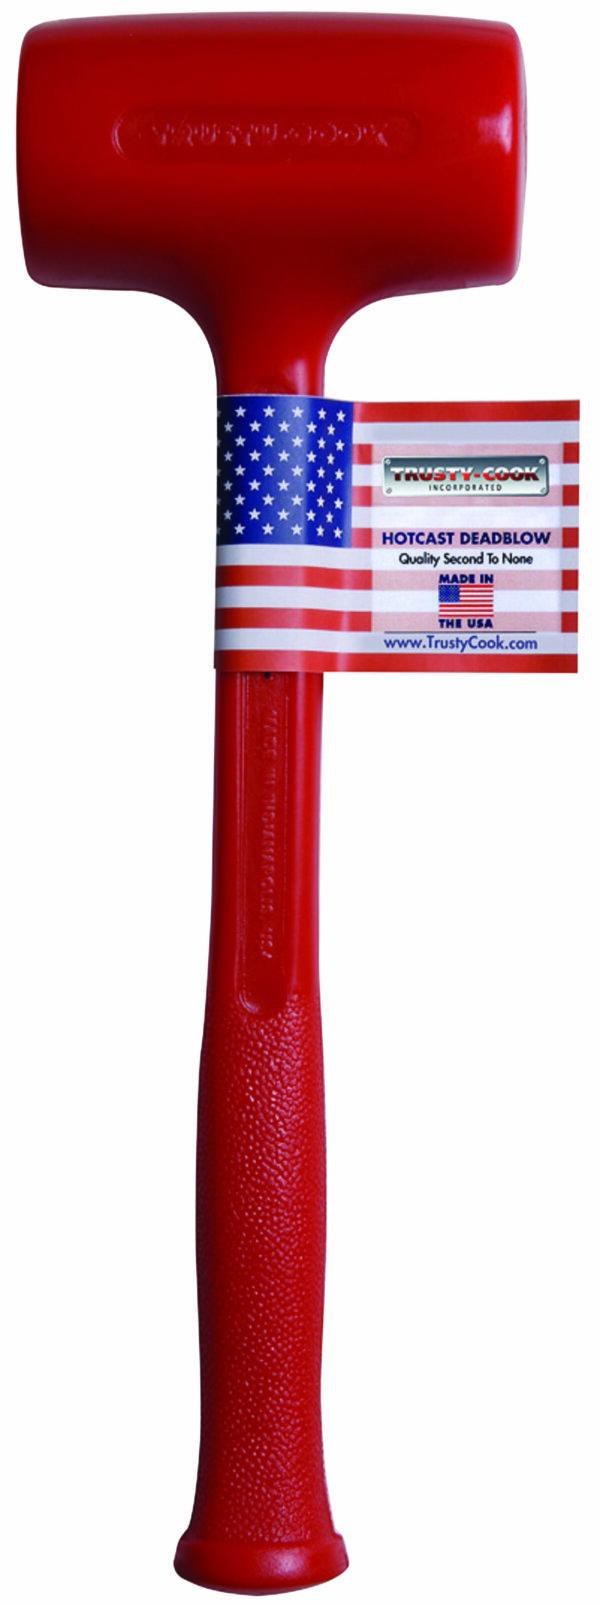 45 oz. Standard Polyurethane Dead Blow Hammer